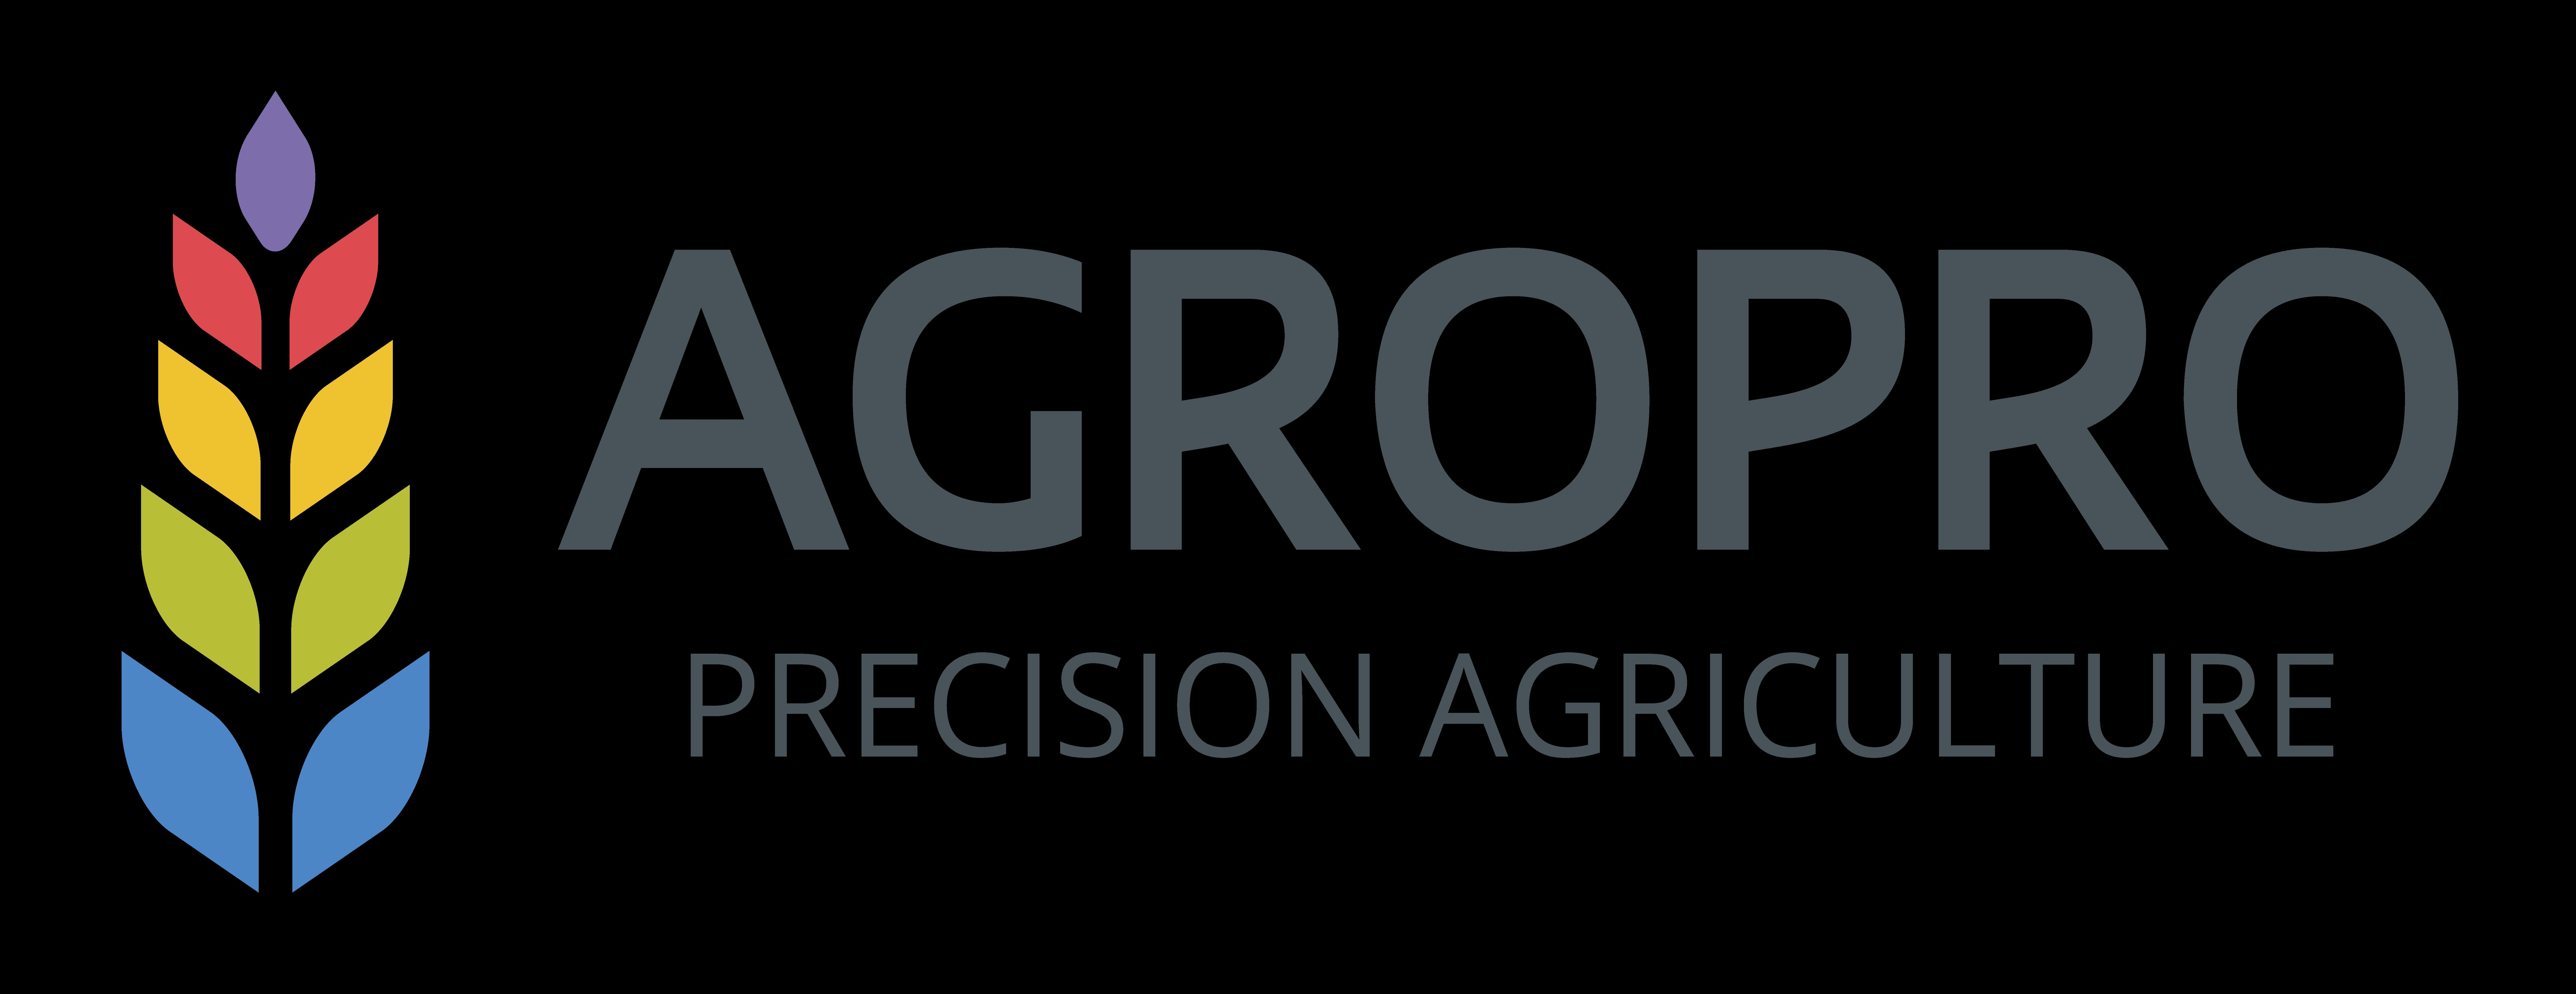 Agropro logo